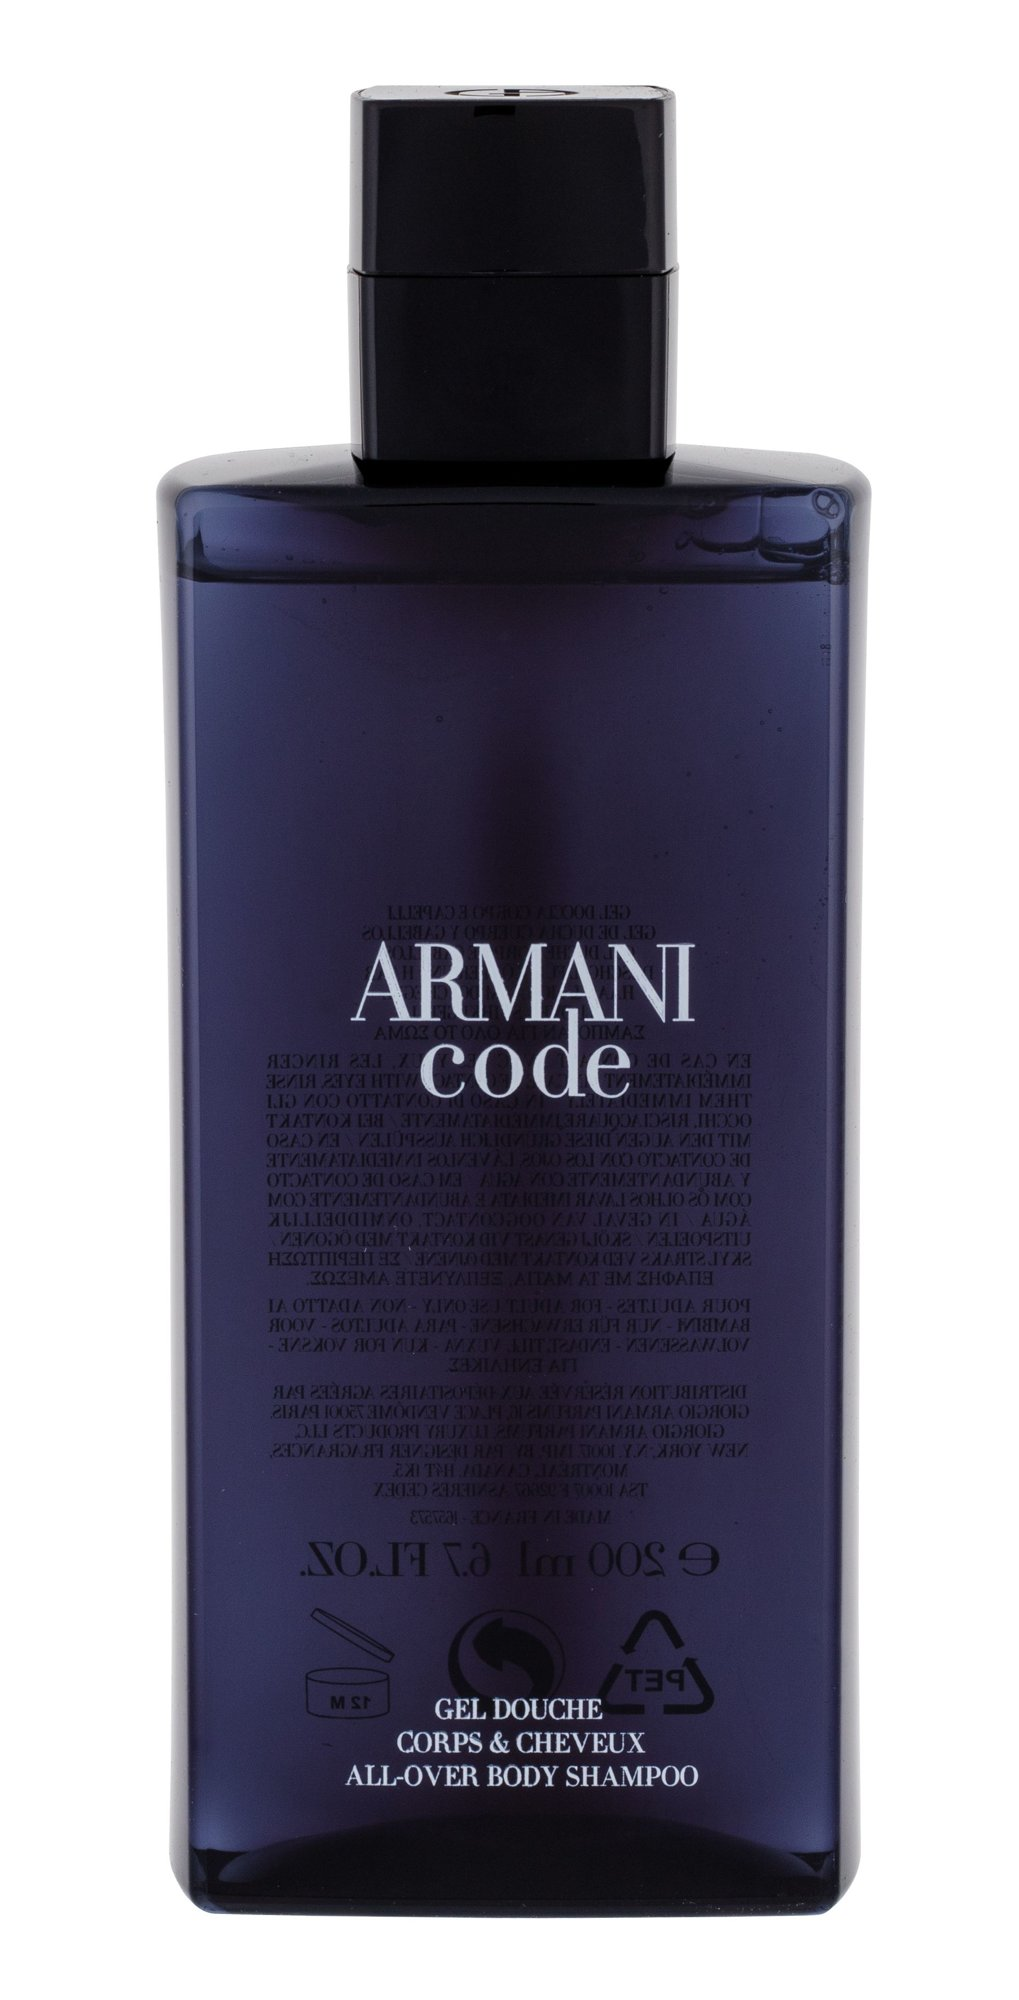 Giorgio Armani Armani Code Pour Homme Shower gel 200ml